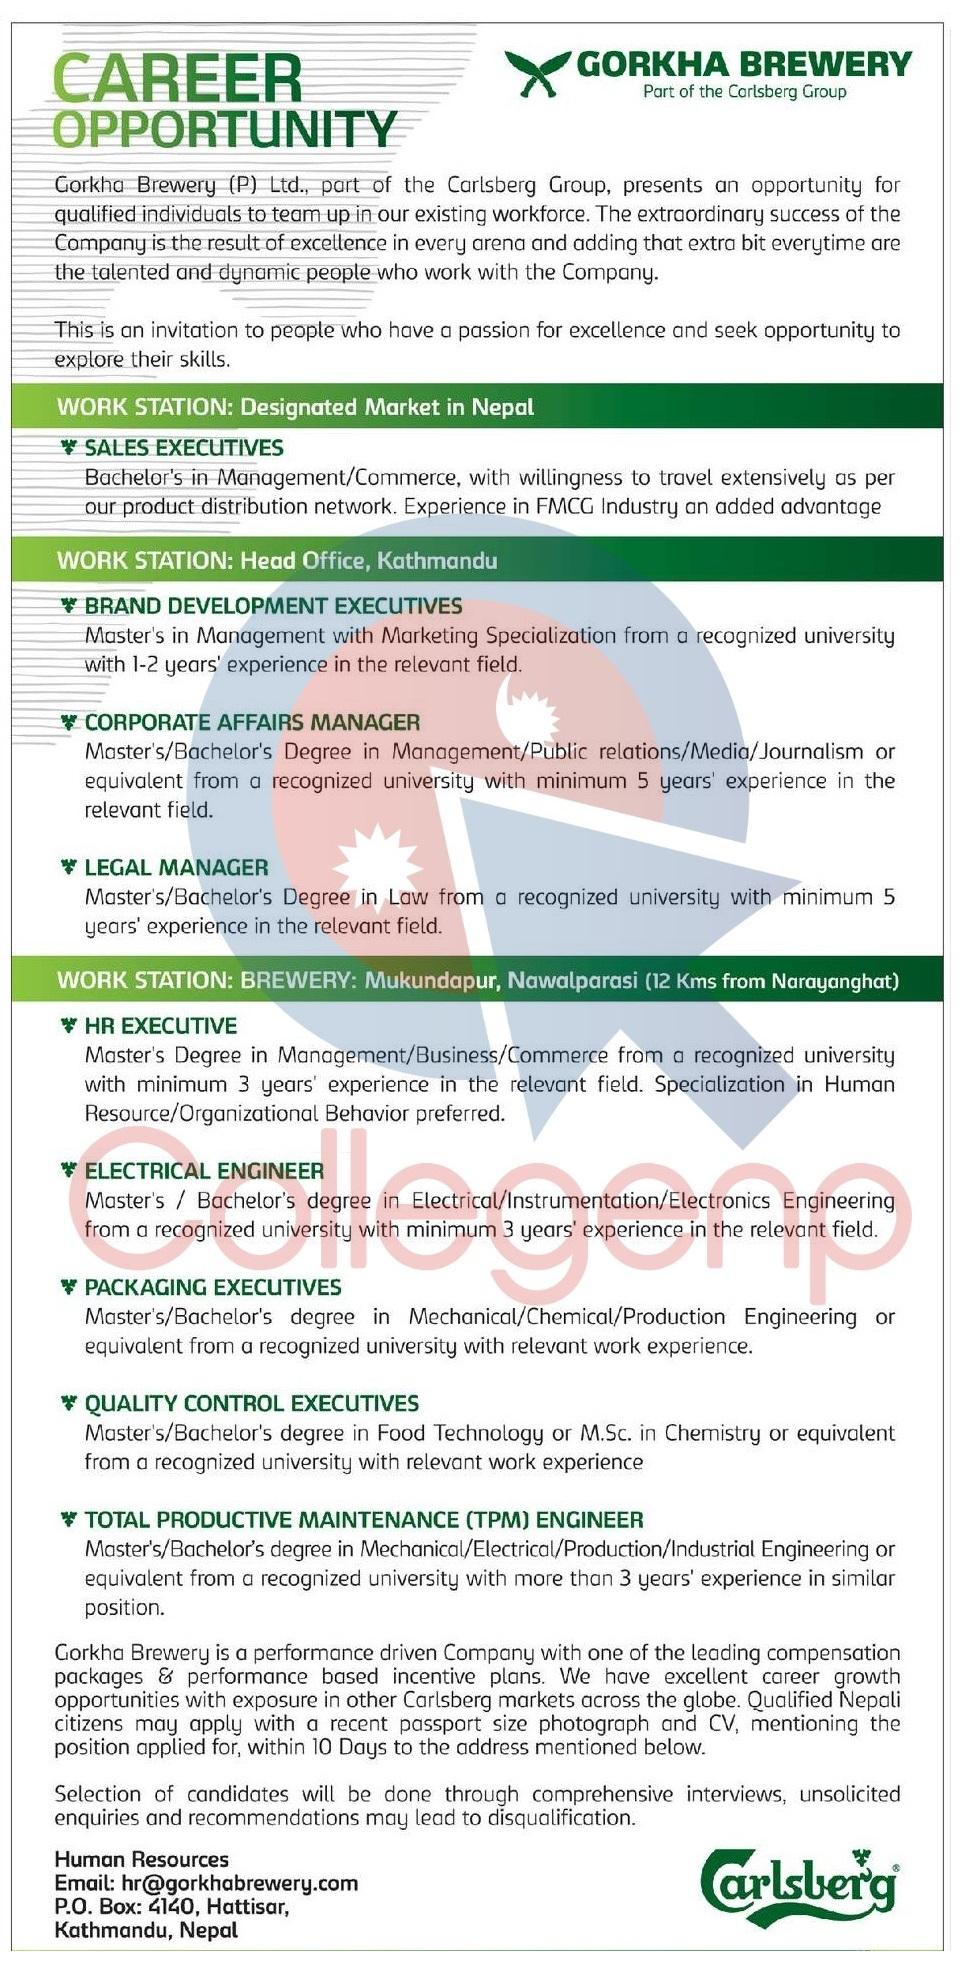 Gorkha Brewery Job Vacancy Announcement | Collegenp